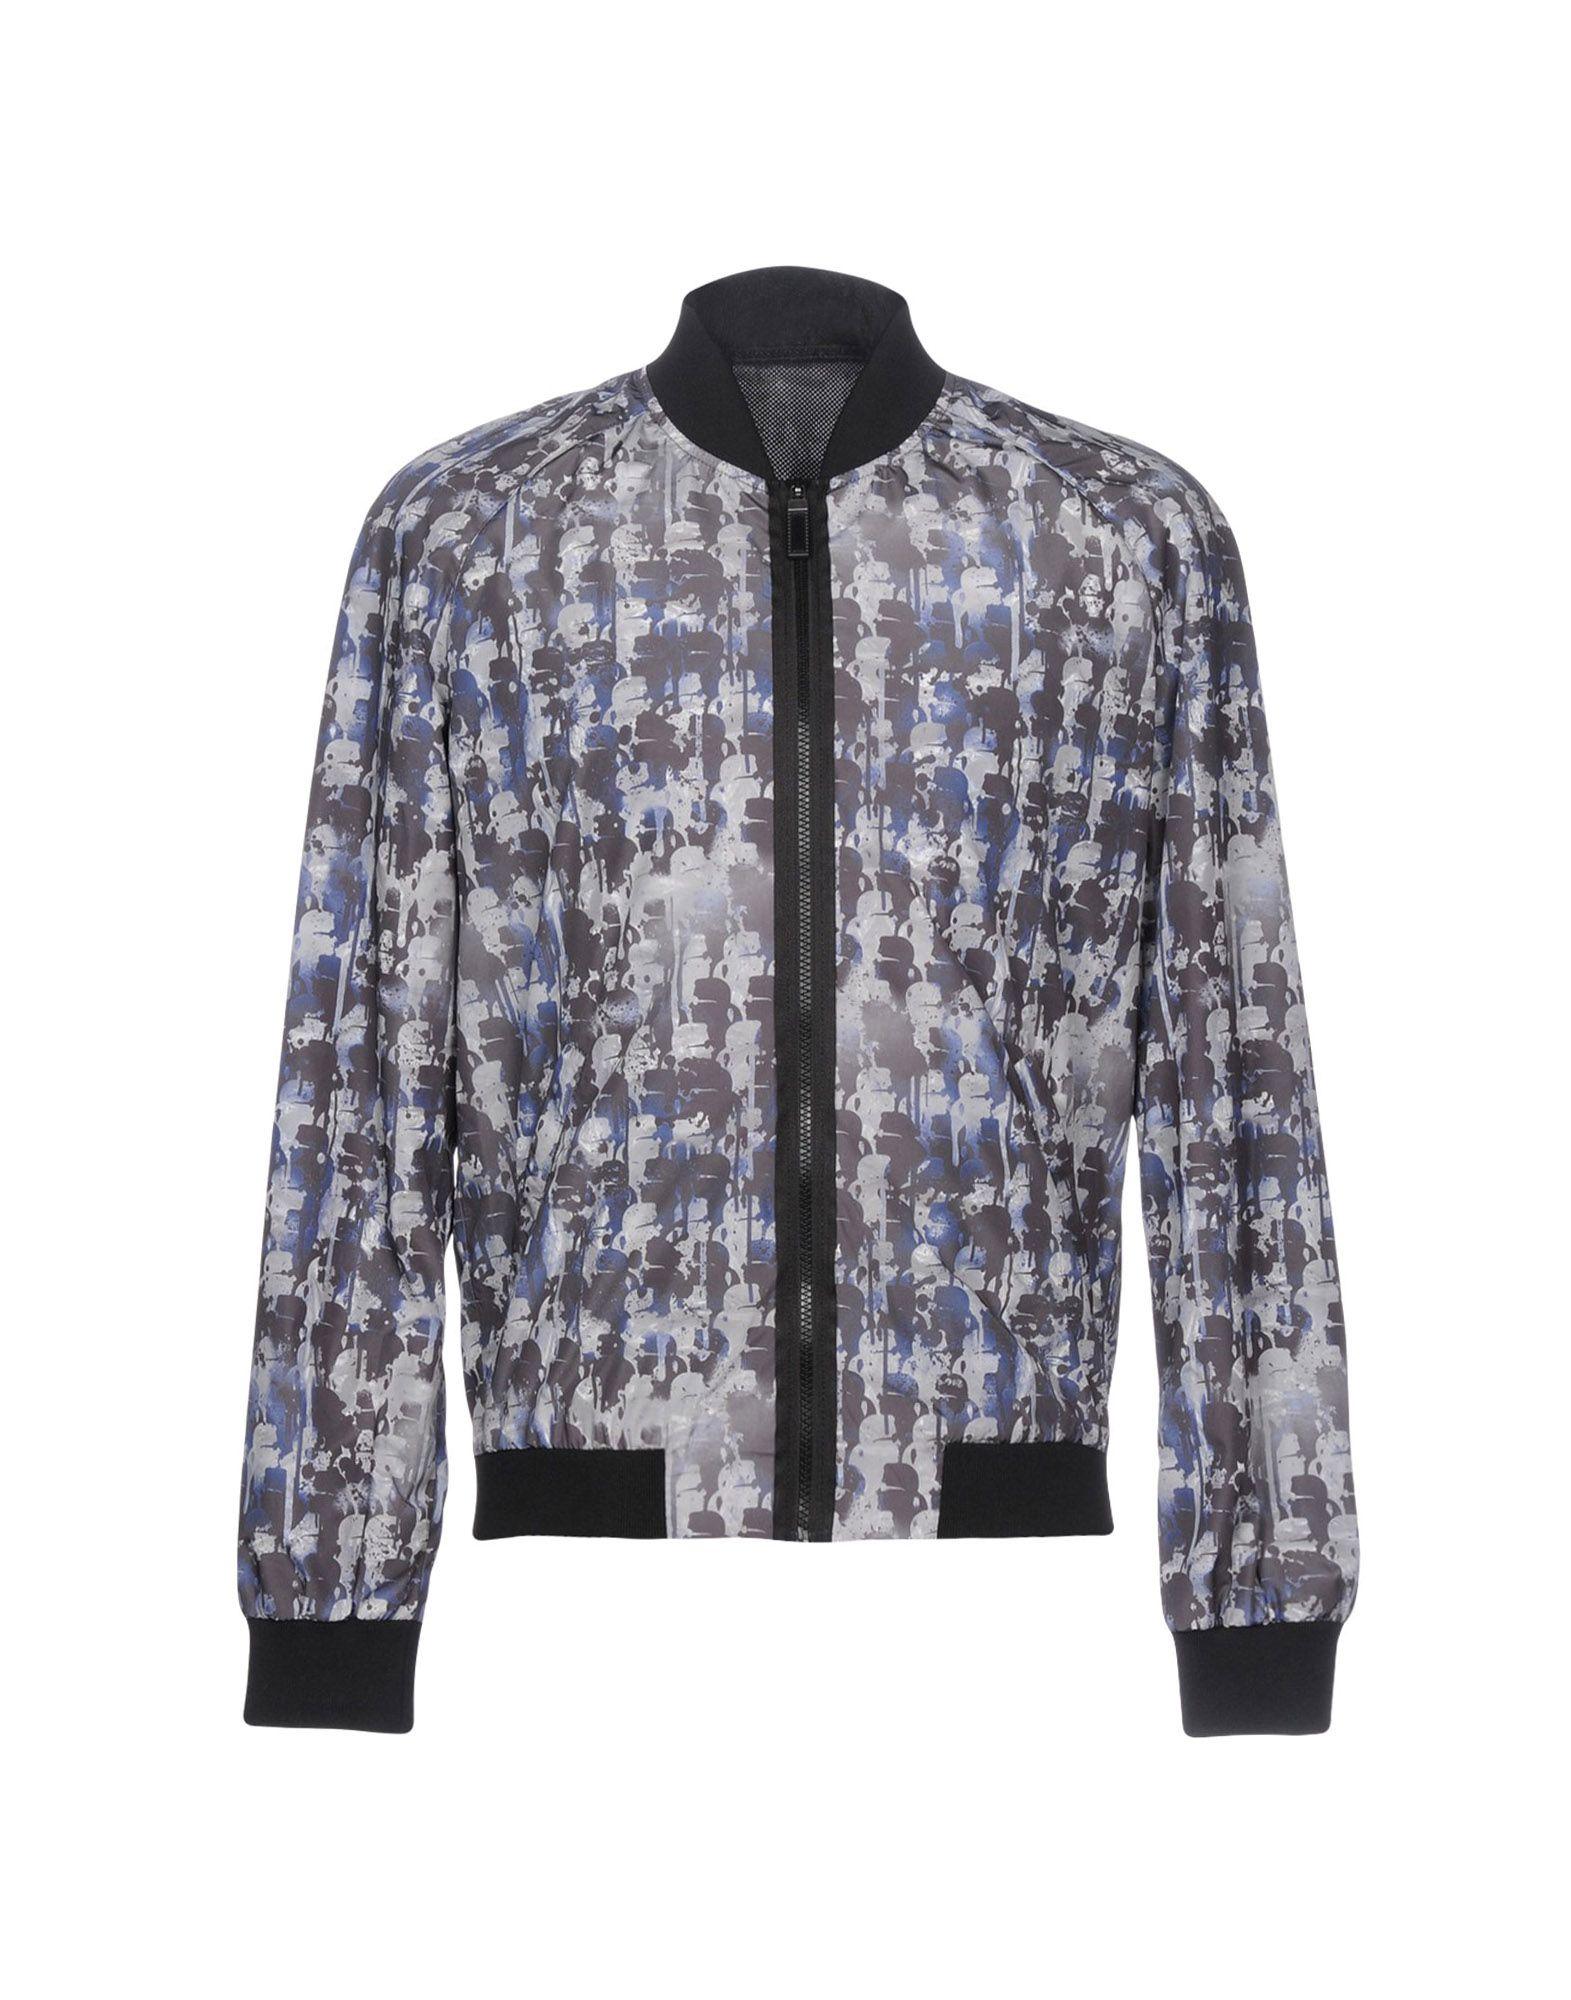 KARL LAGERFELD Куртка lagerfeld lagerfeld куртка 121821